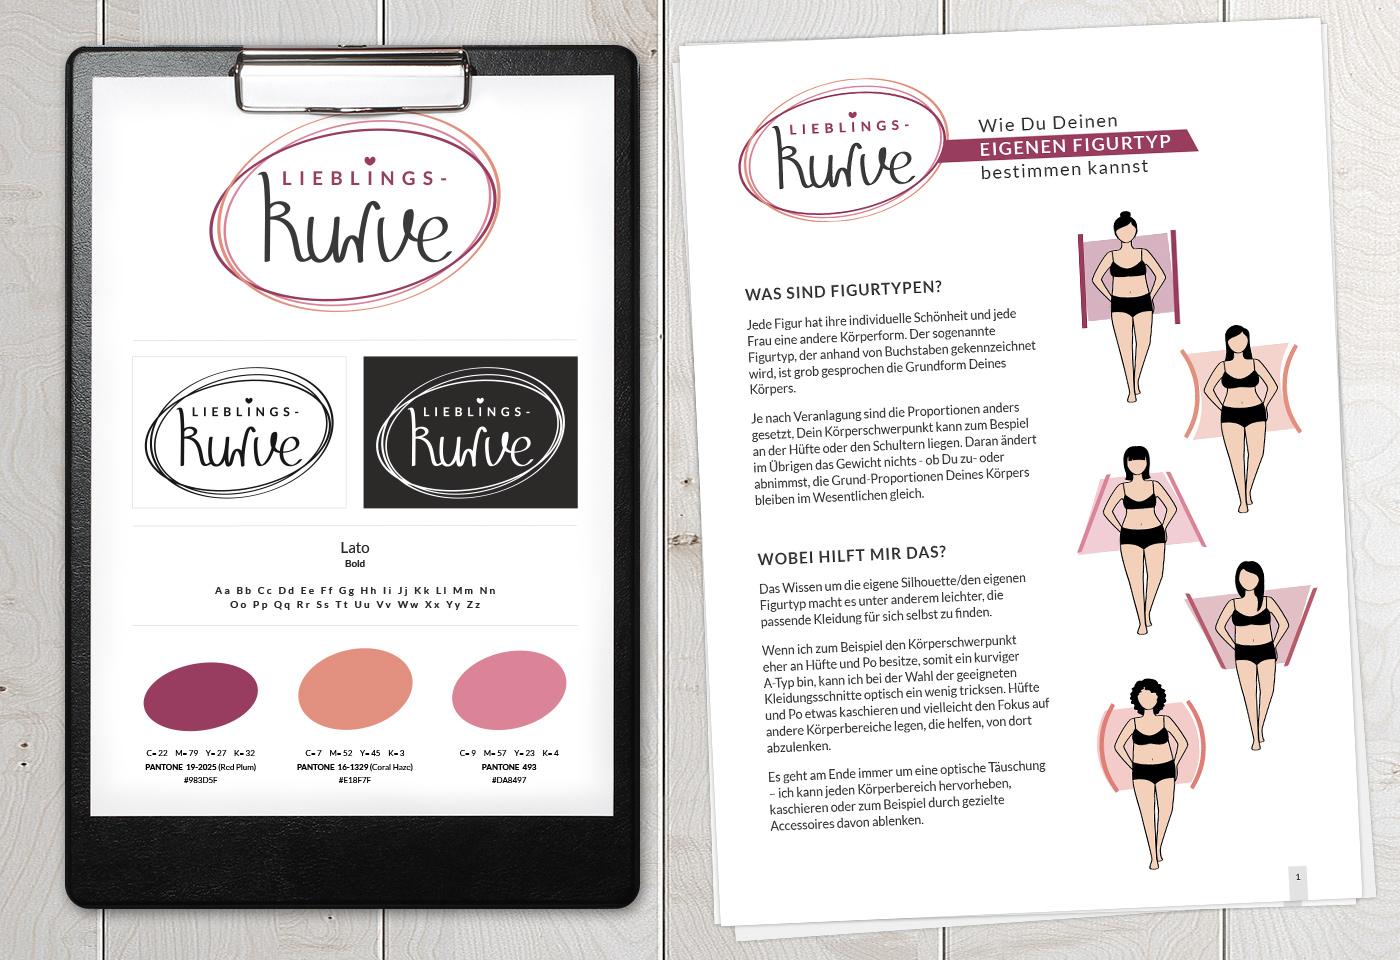 Geschäftsausstattung und Corporate Design: Lieblingskurve – Mode- & Stilberatung (Milena Georg)